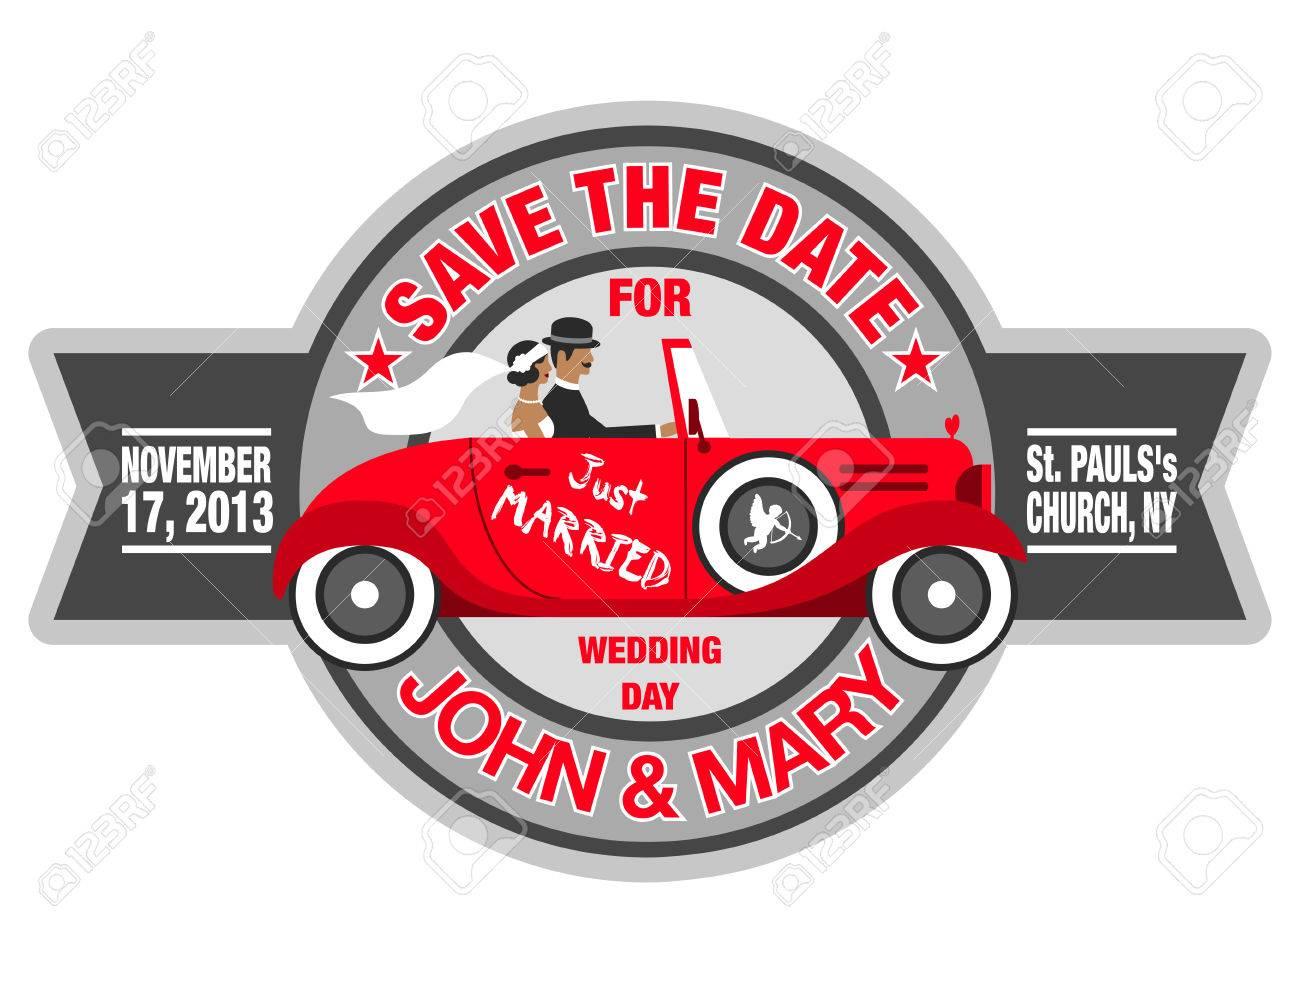 Wedding Invitation With Bride And Groom In Retro Car Royalty Free ...